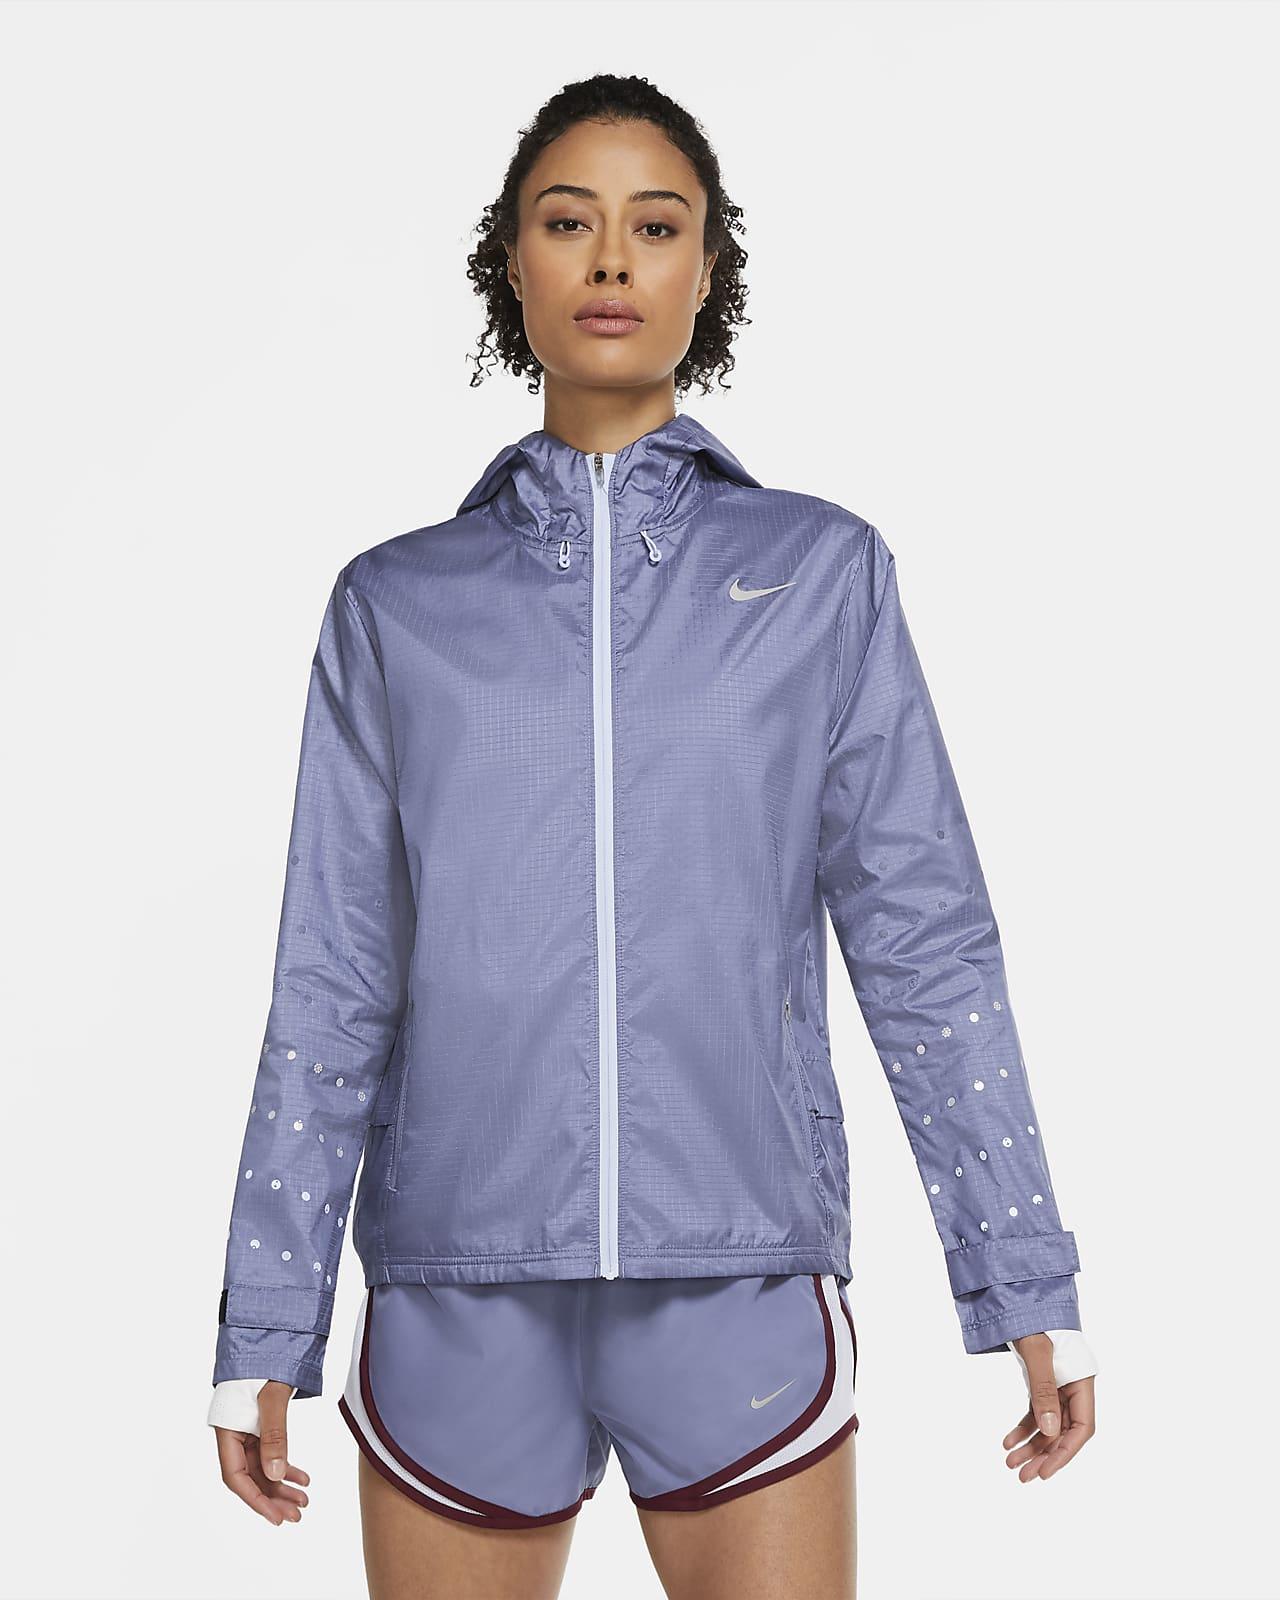 Nike Essential Flash női kapucnis futókabát